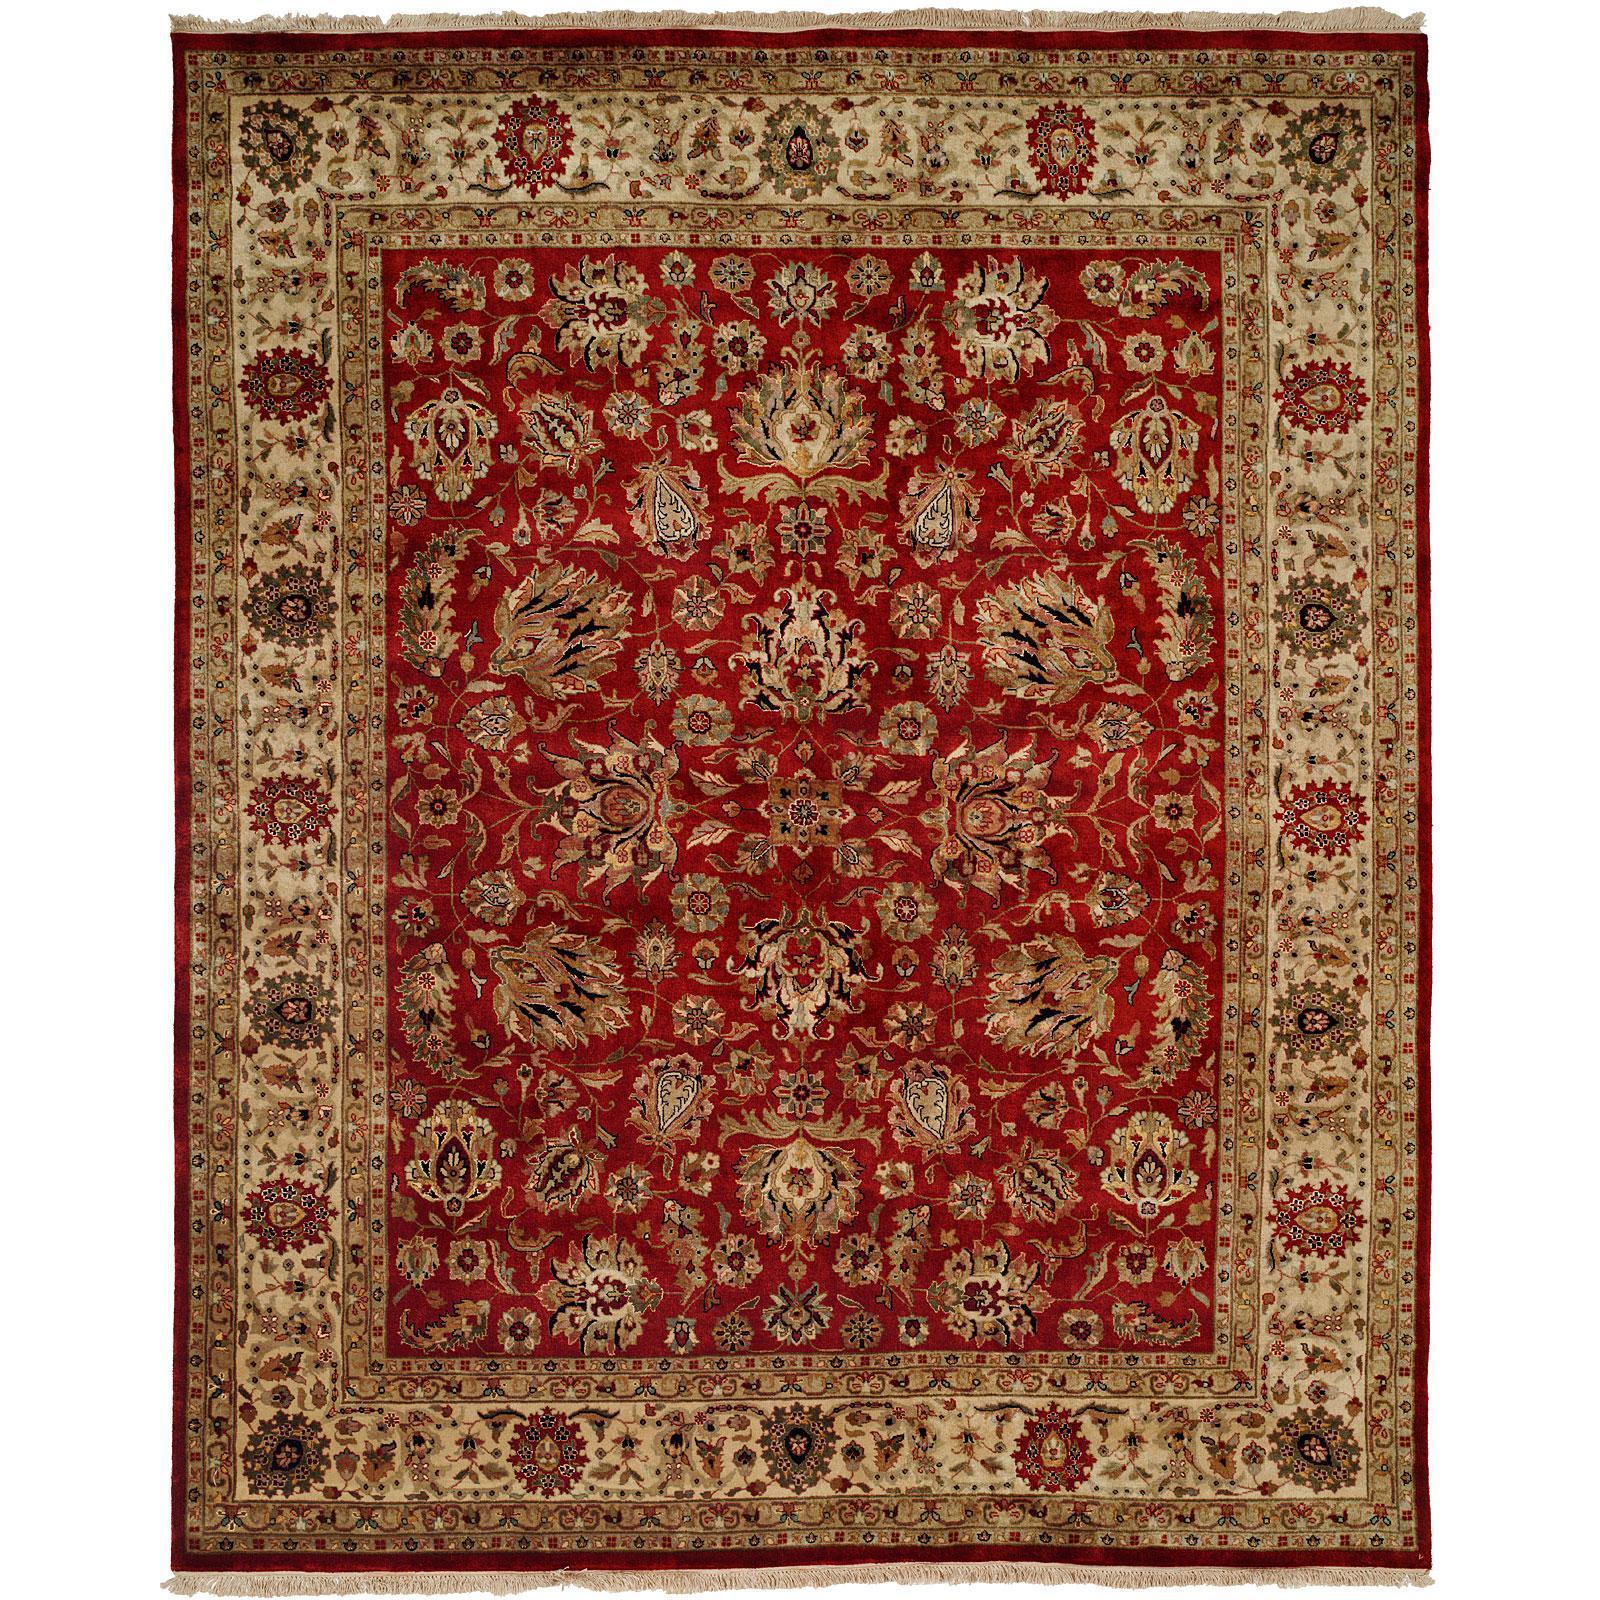 Tabriz Hand-knotted Rust/Ivory New Zealand Wool/Silk Indoor Rectangular Area Rug (6 x 9) - 6 x 9 (TR-554 69)